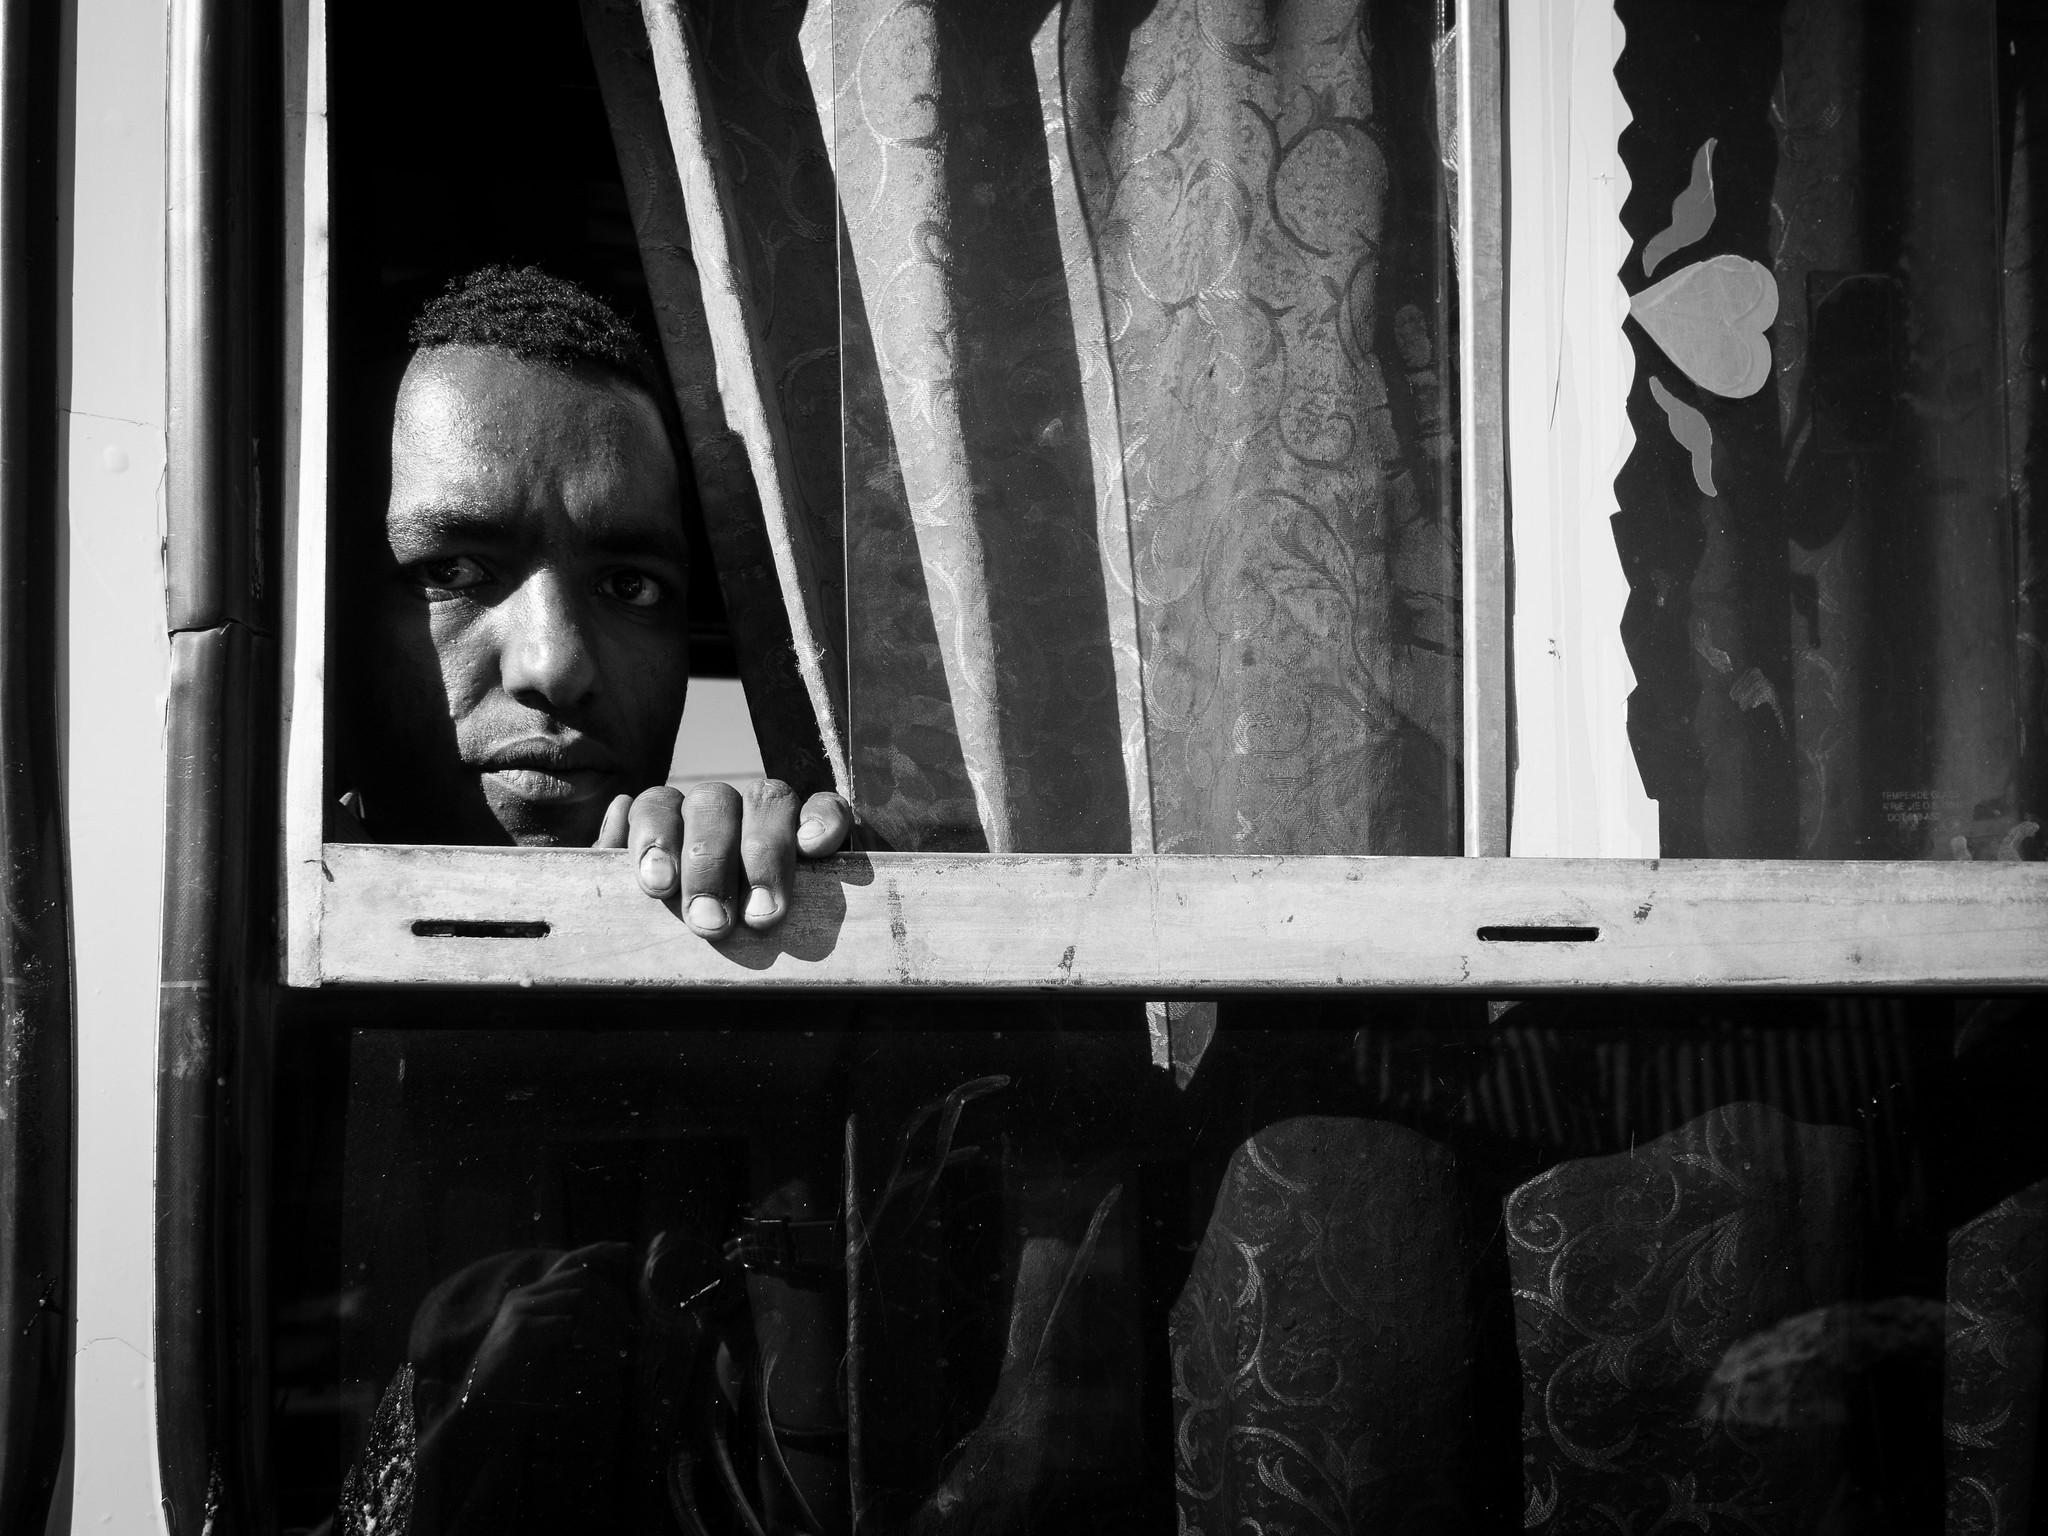 Homeless Children in Ethiopia